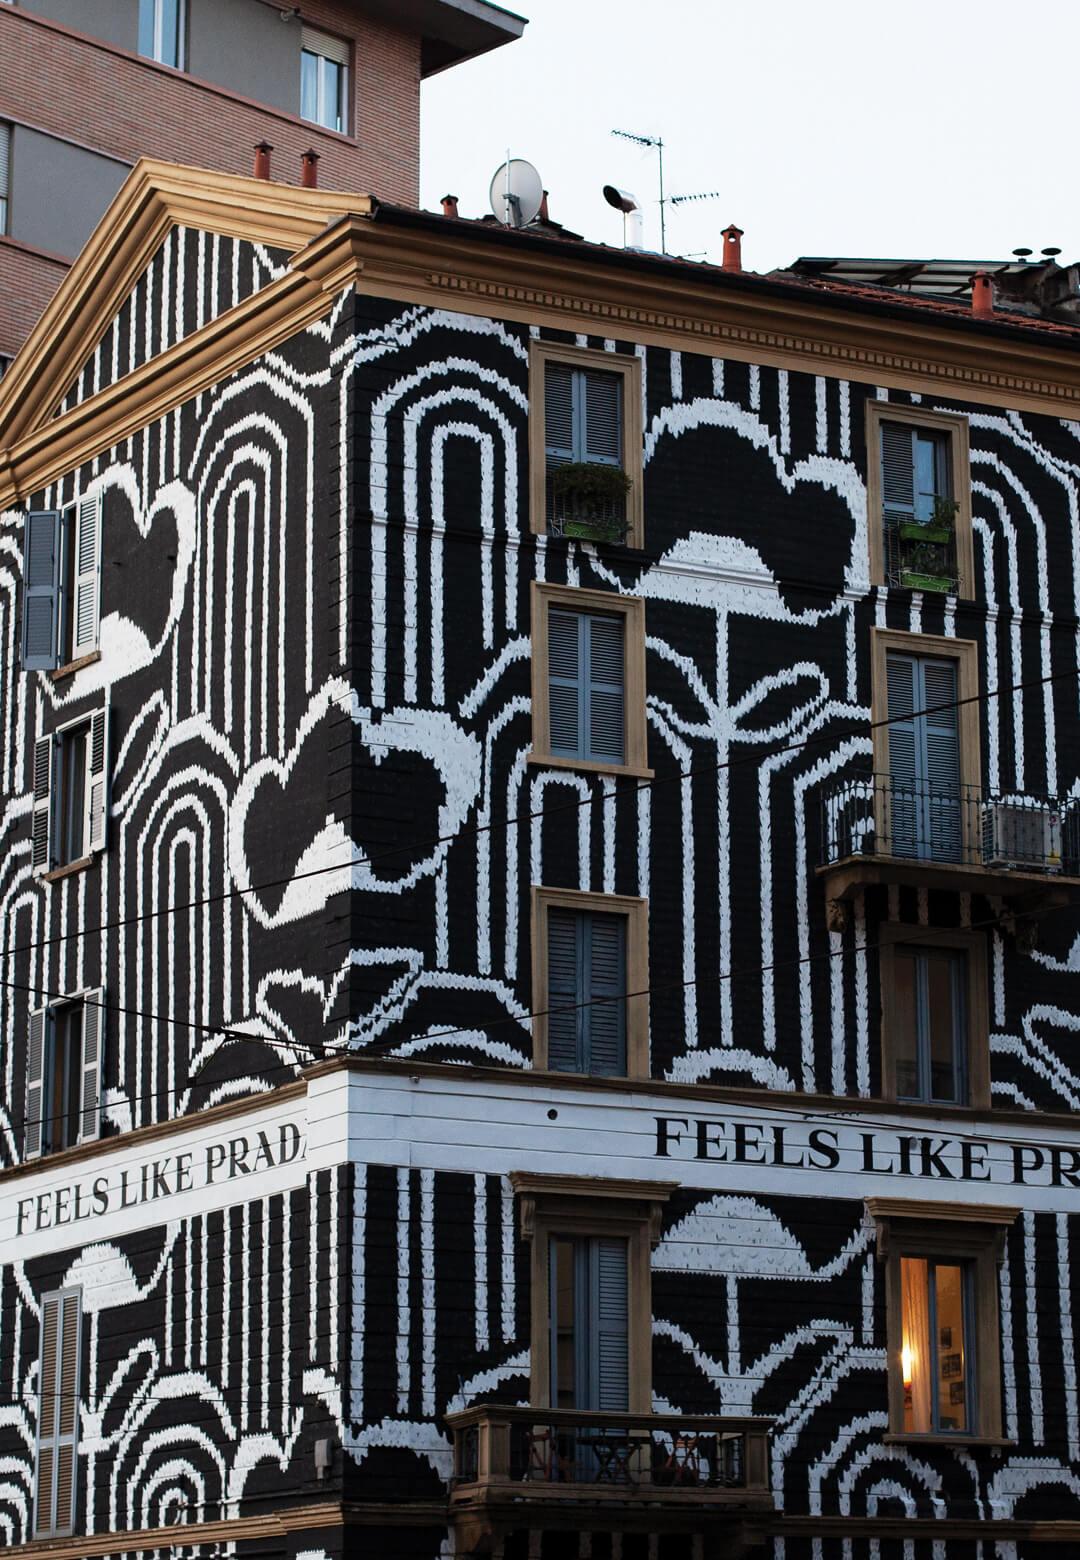 Prada has transformed building façades in Milan to promote its Fall/Winter 2021 campaign titled 'Feels Like Prada' | Feels Like Prada Installations | STIRworld